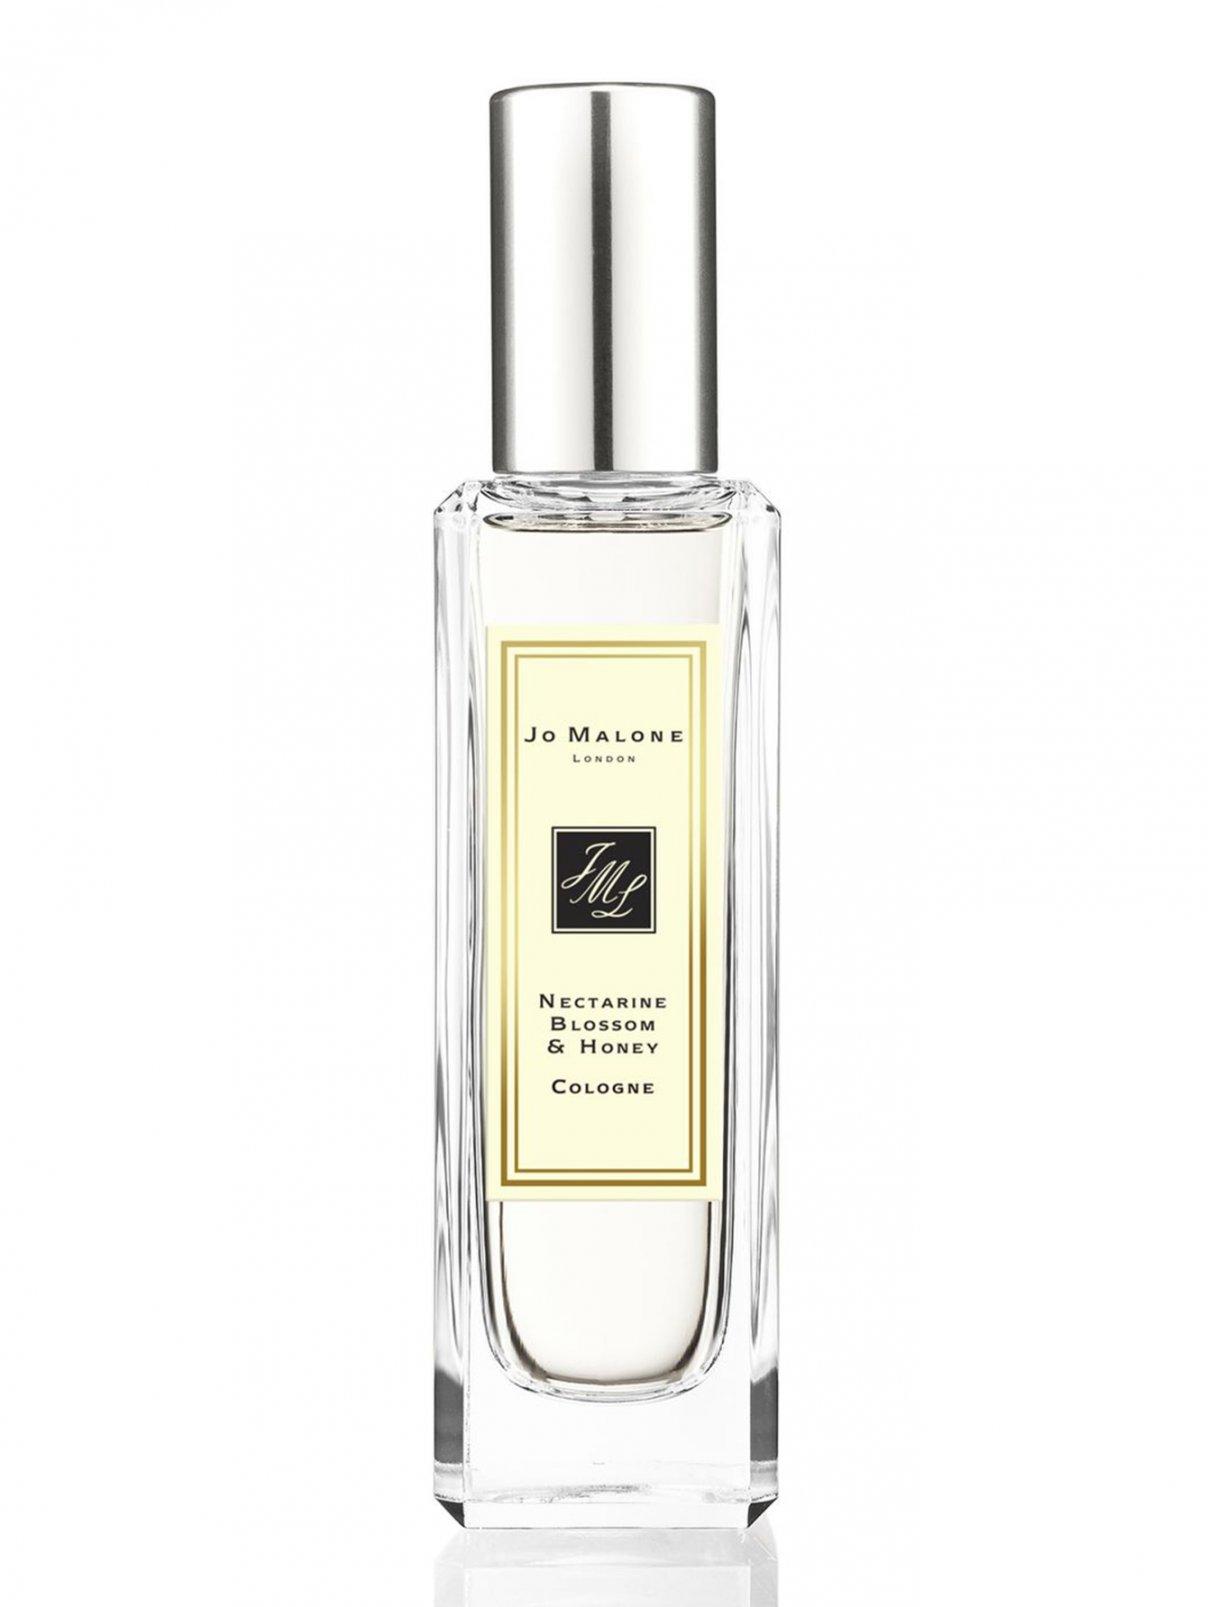 Одеколон 30 мл Nectarine Blossom & Honey Jo Malone London  –  Общий вид